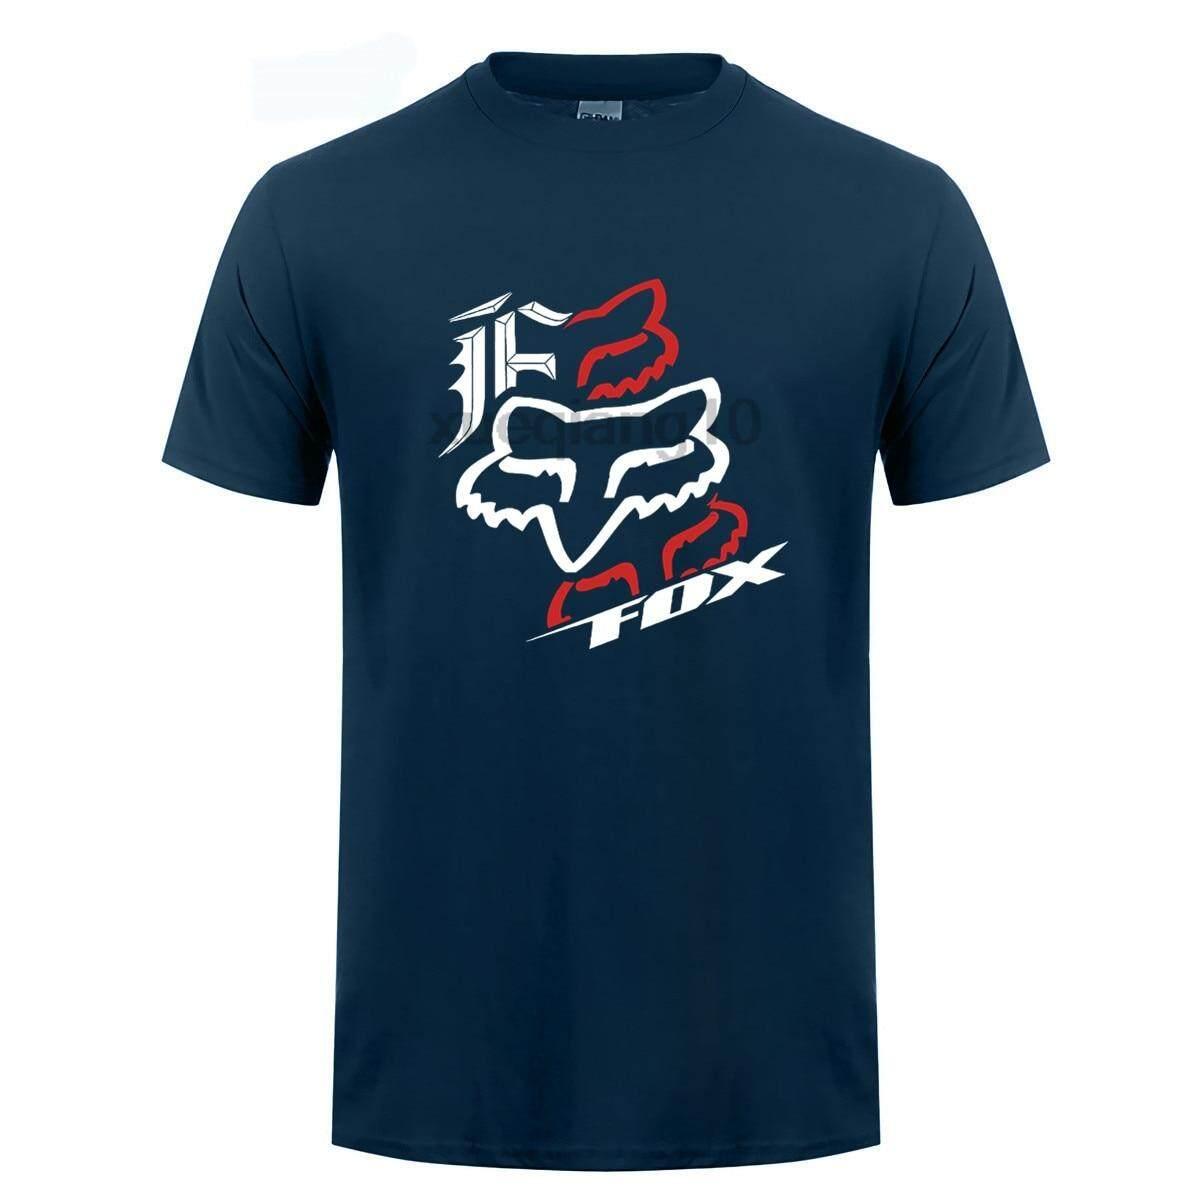 2021 best sell tshirt fox racing t-shirt logo clothing desktop wallpaper